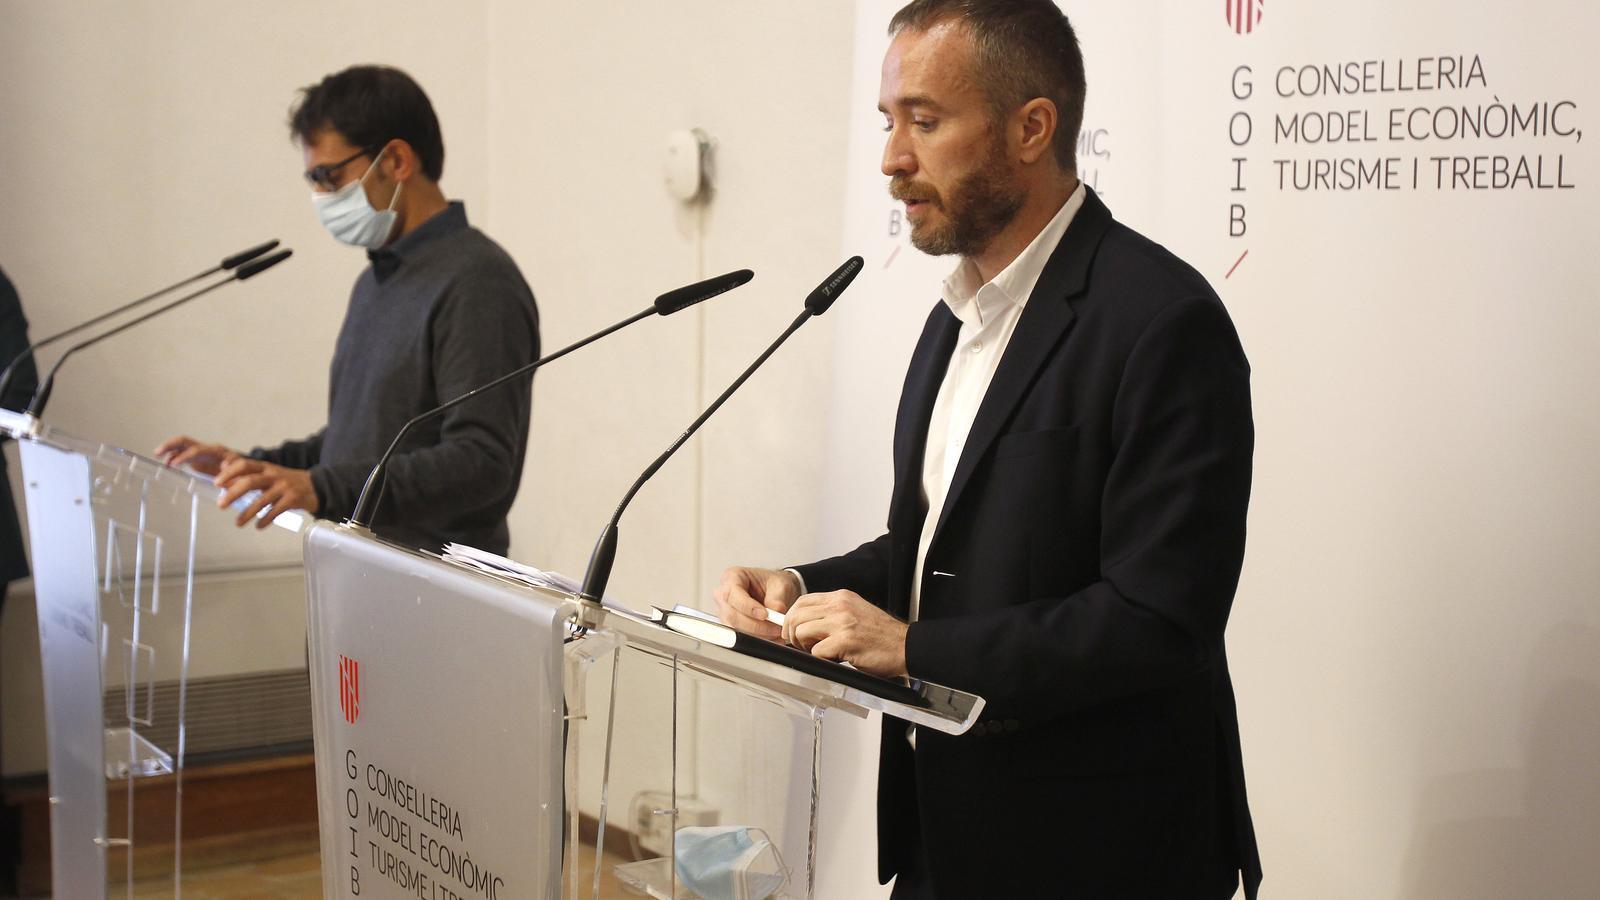 El conseller de Turisme, Iago Negueruela, i el director general de Turespaña, Miguel Sanz. / Isaac Buj